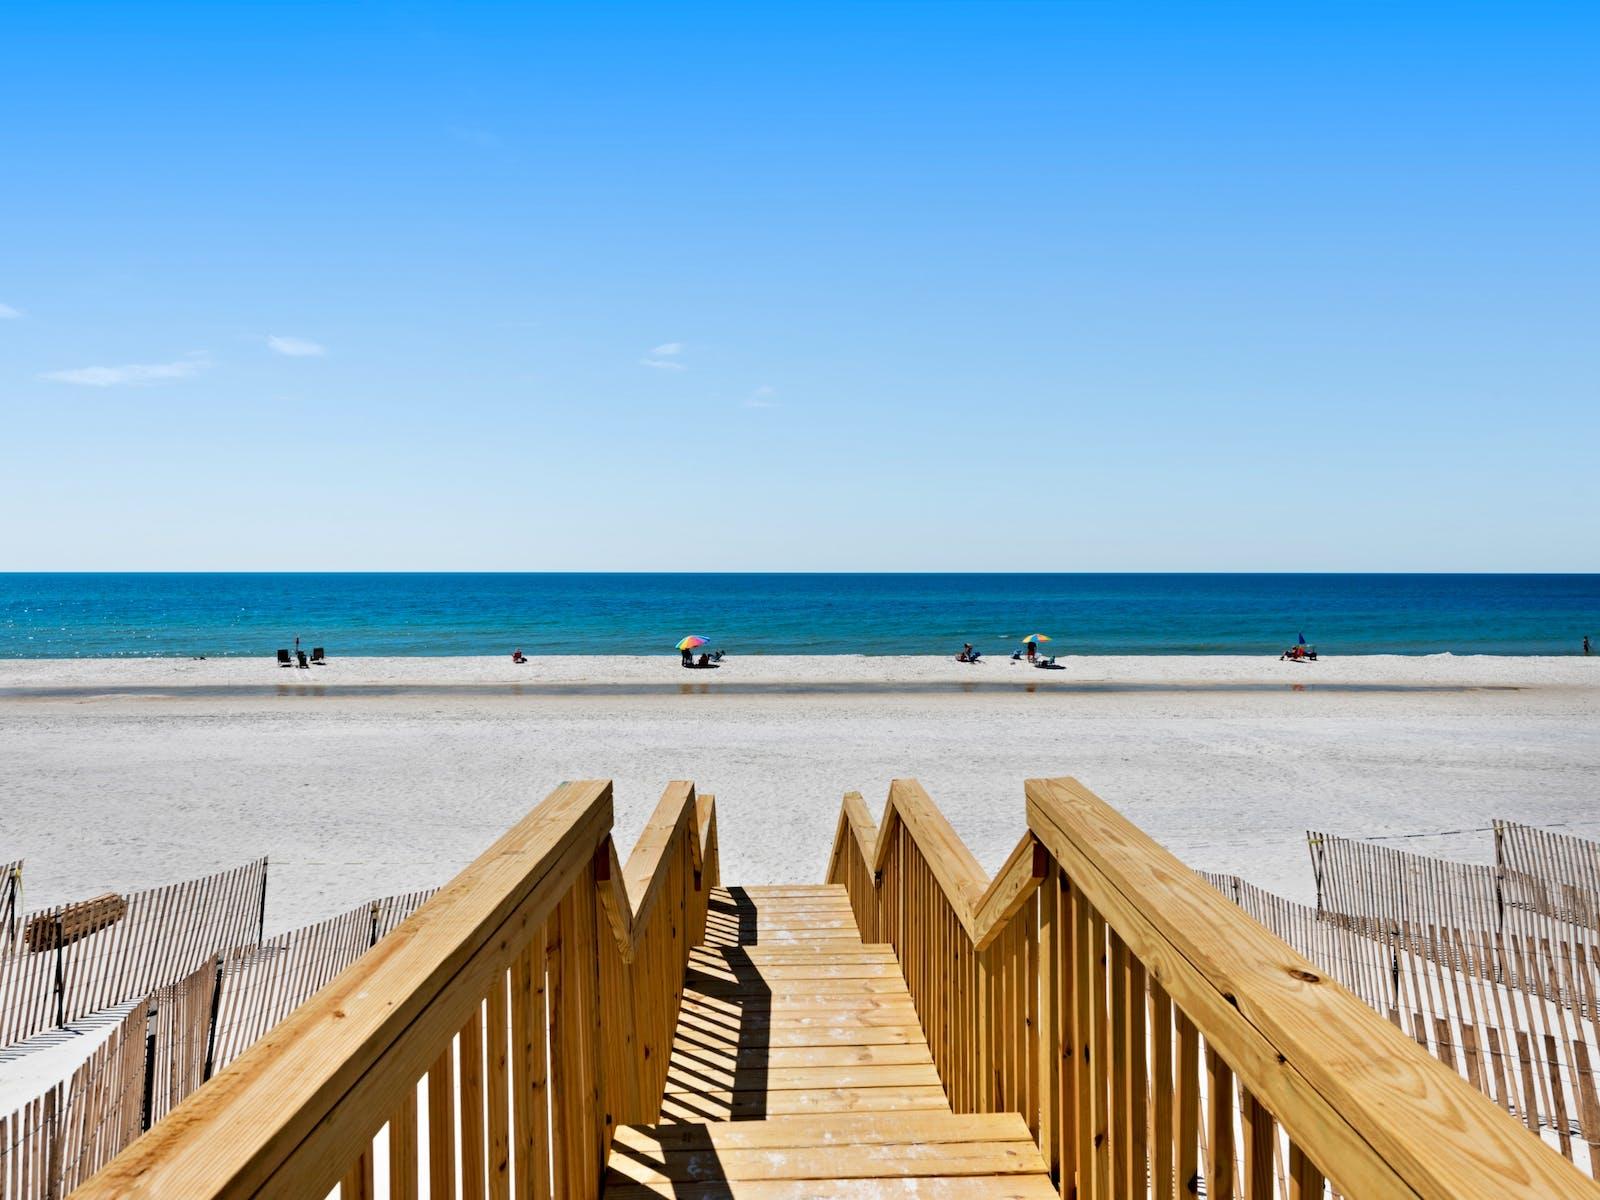 view of beach from Port St. Joe, fl